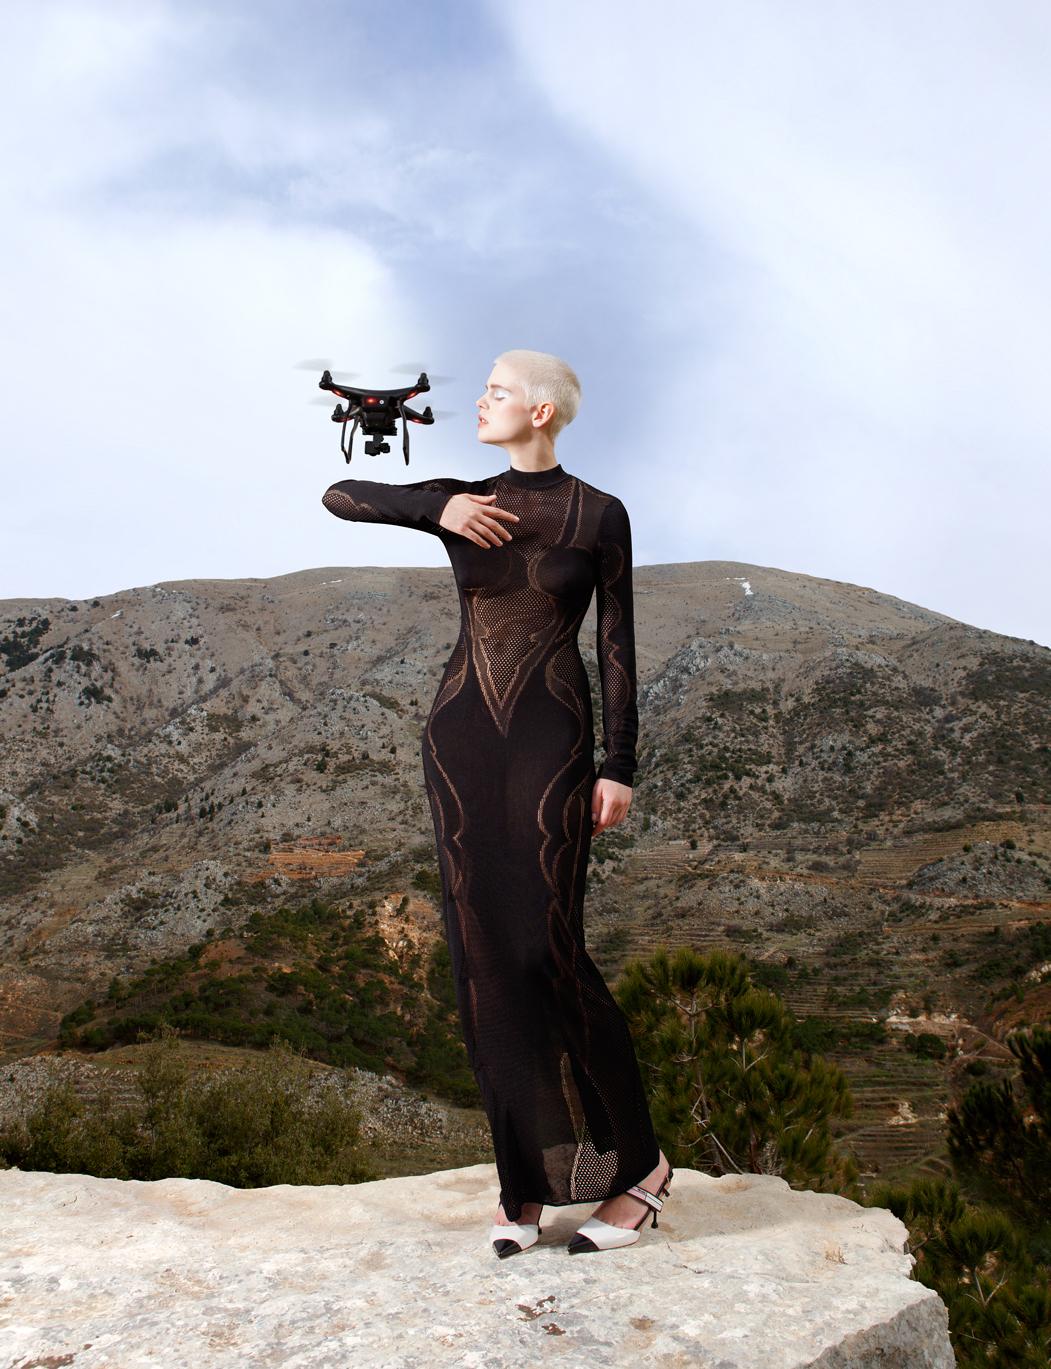 THE DRONES, ELI REZKALLAH, PLASTIK STUDIOS, MARCH 2018 (5).jpg